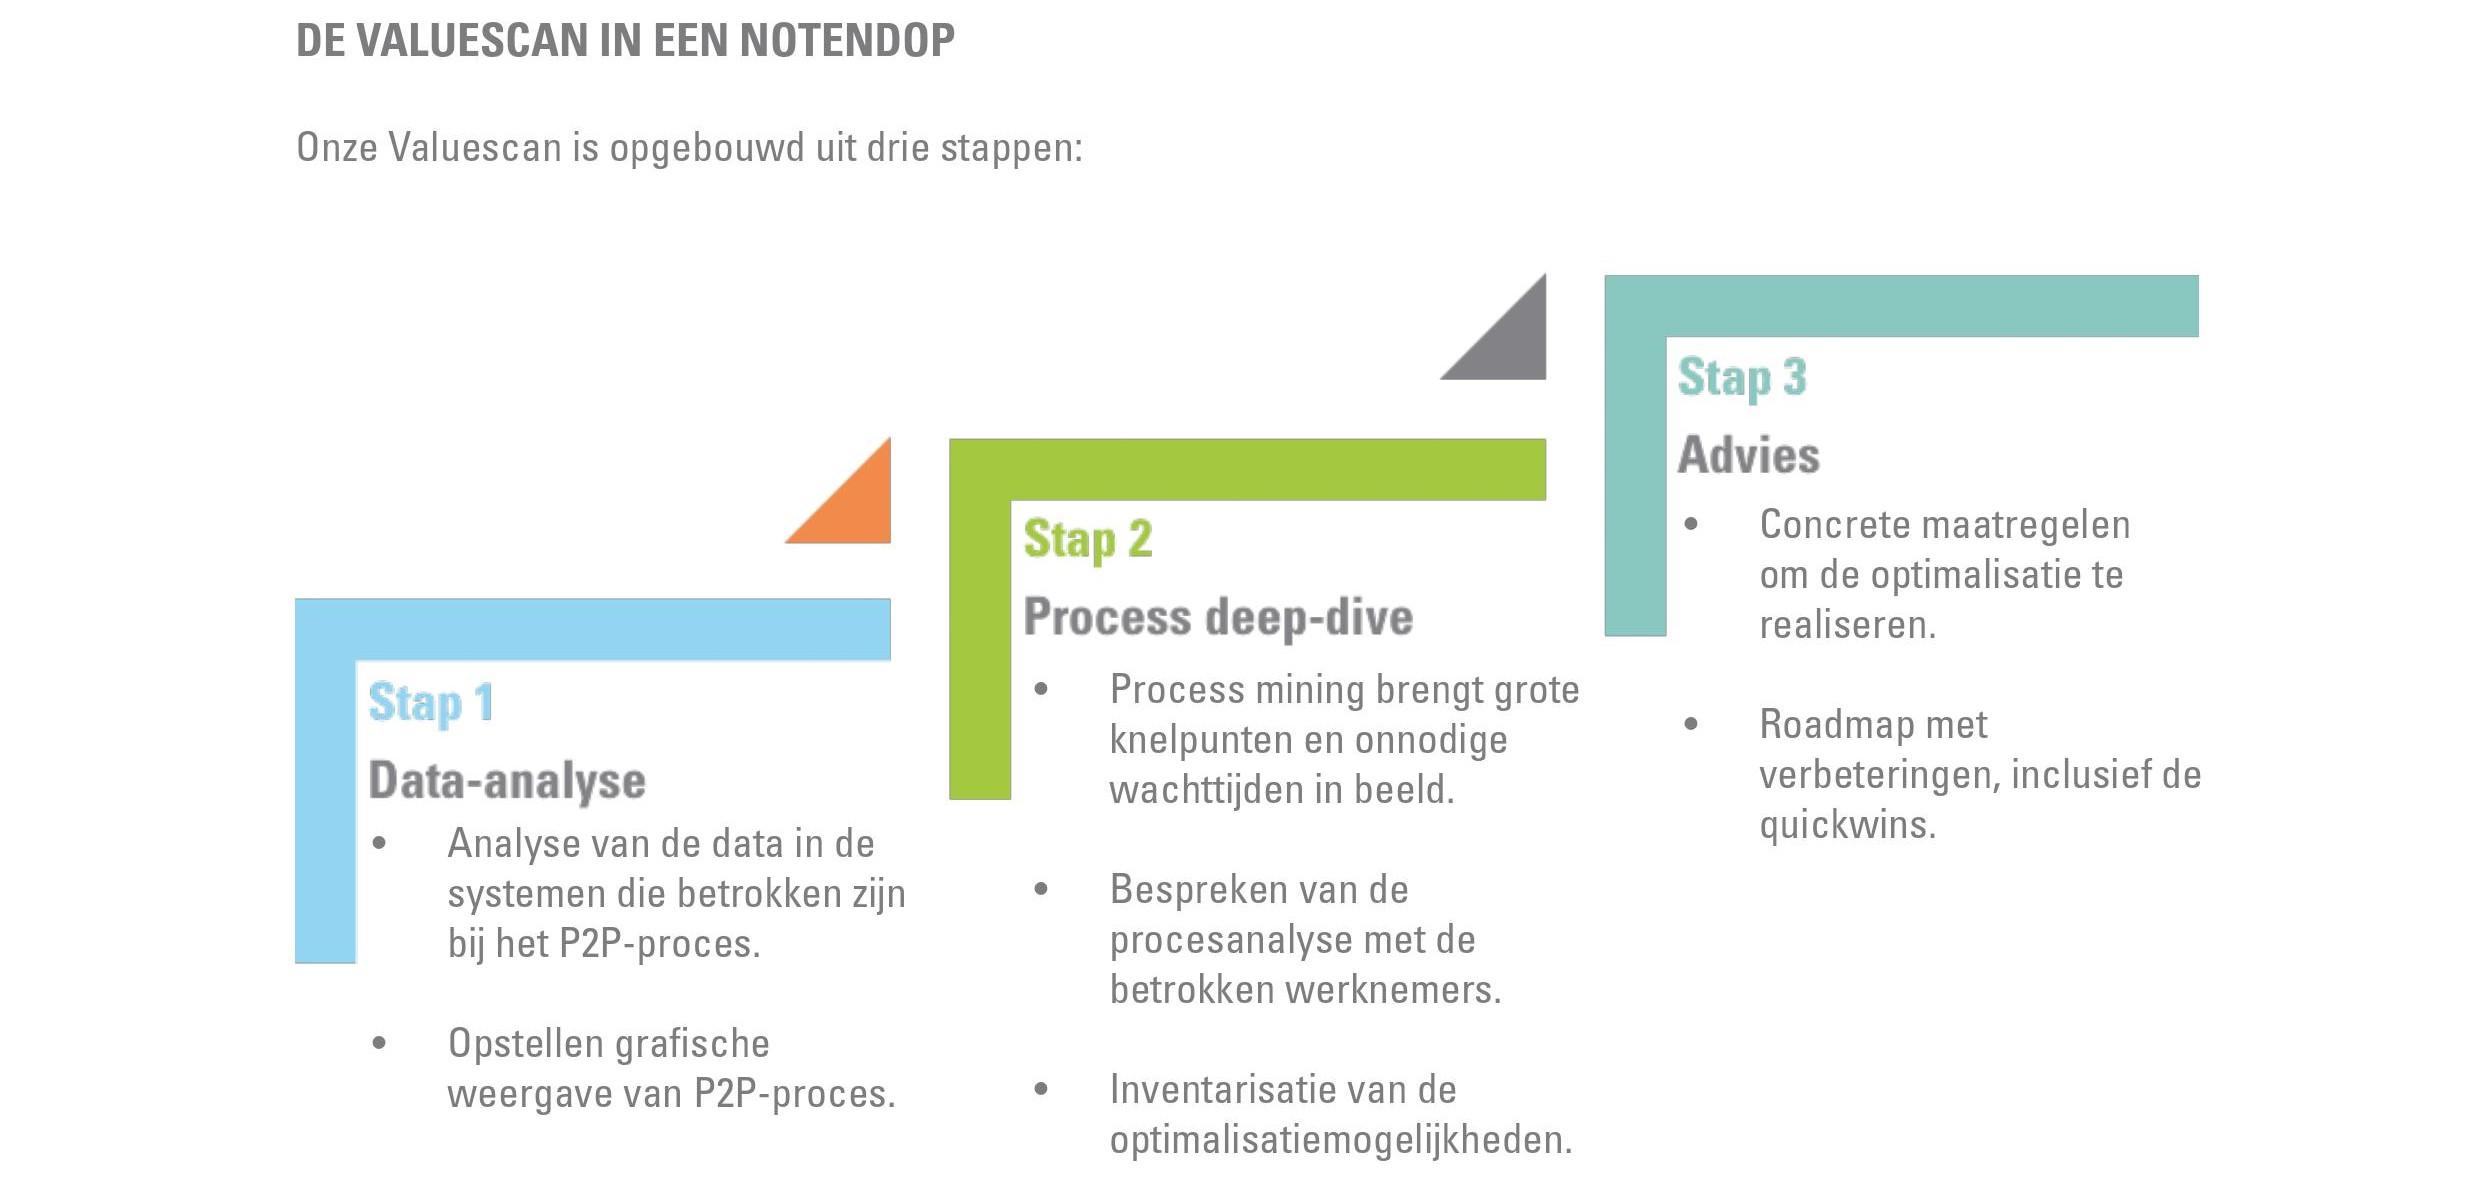 Stappenplan valuescan P2P